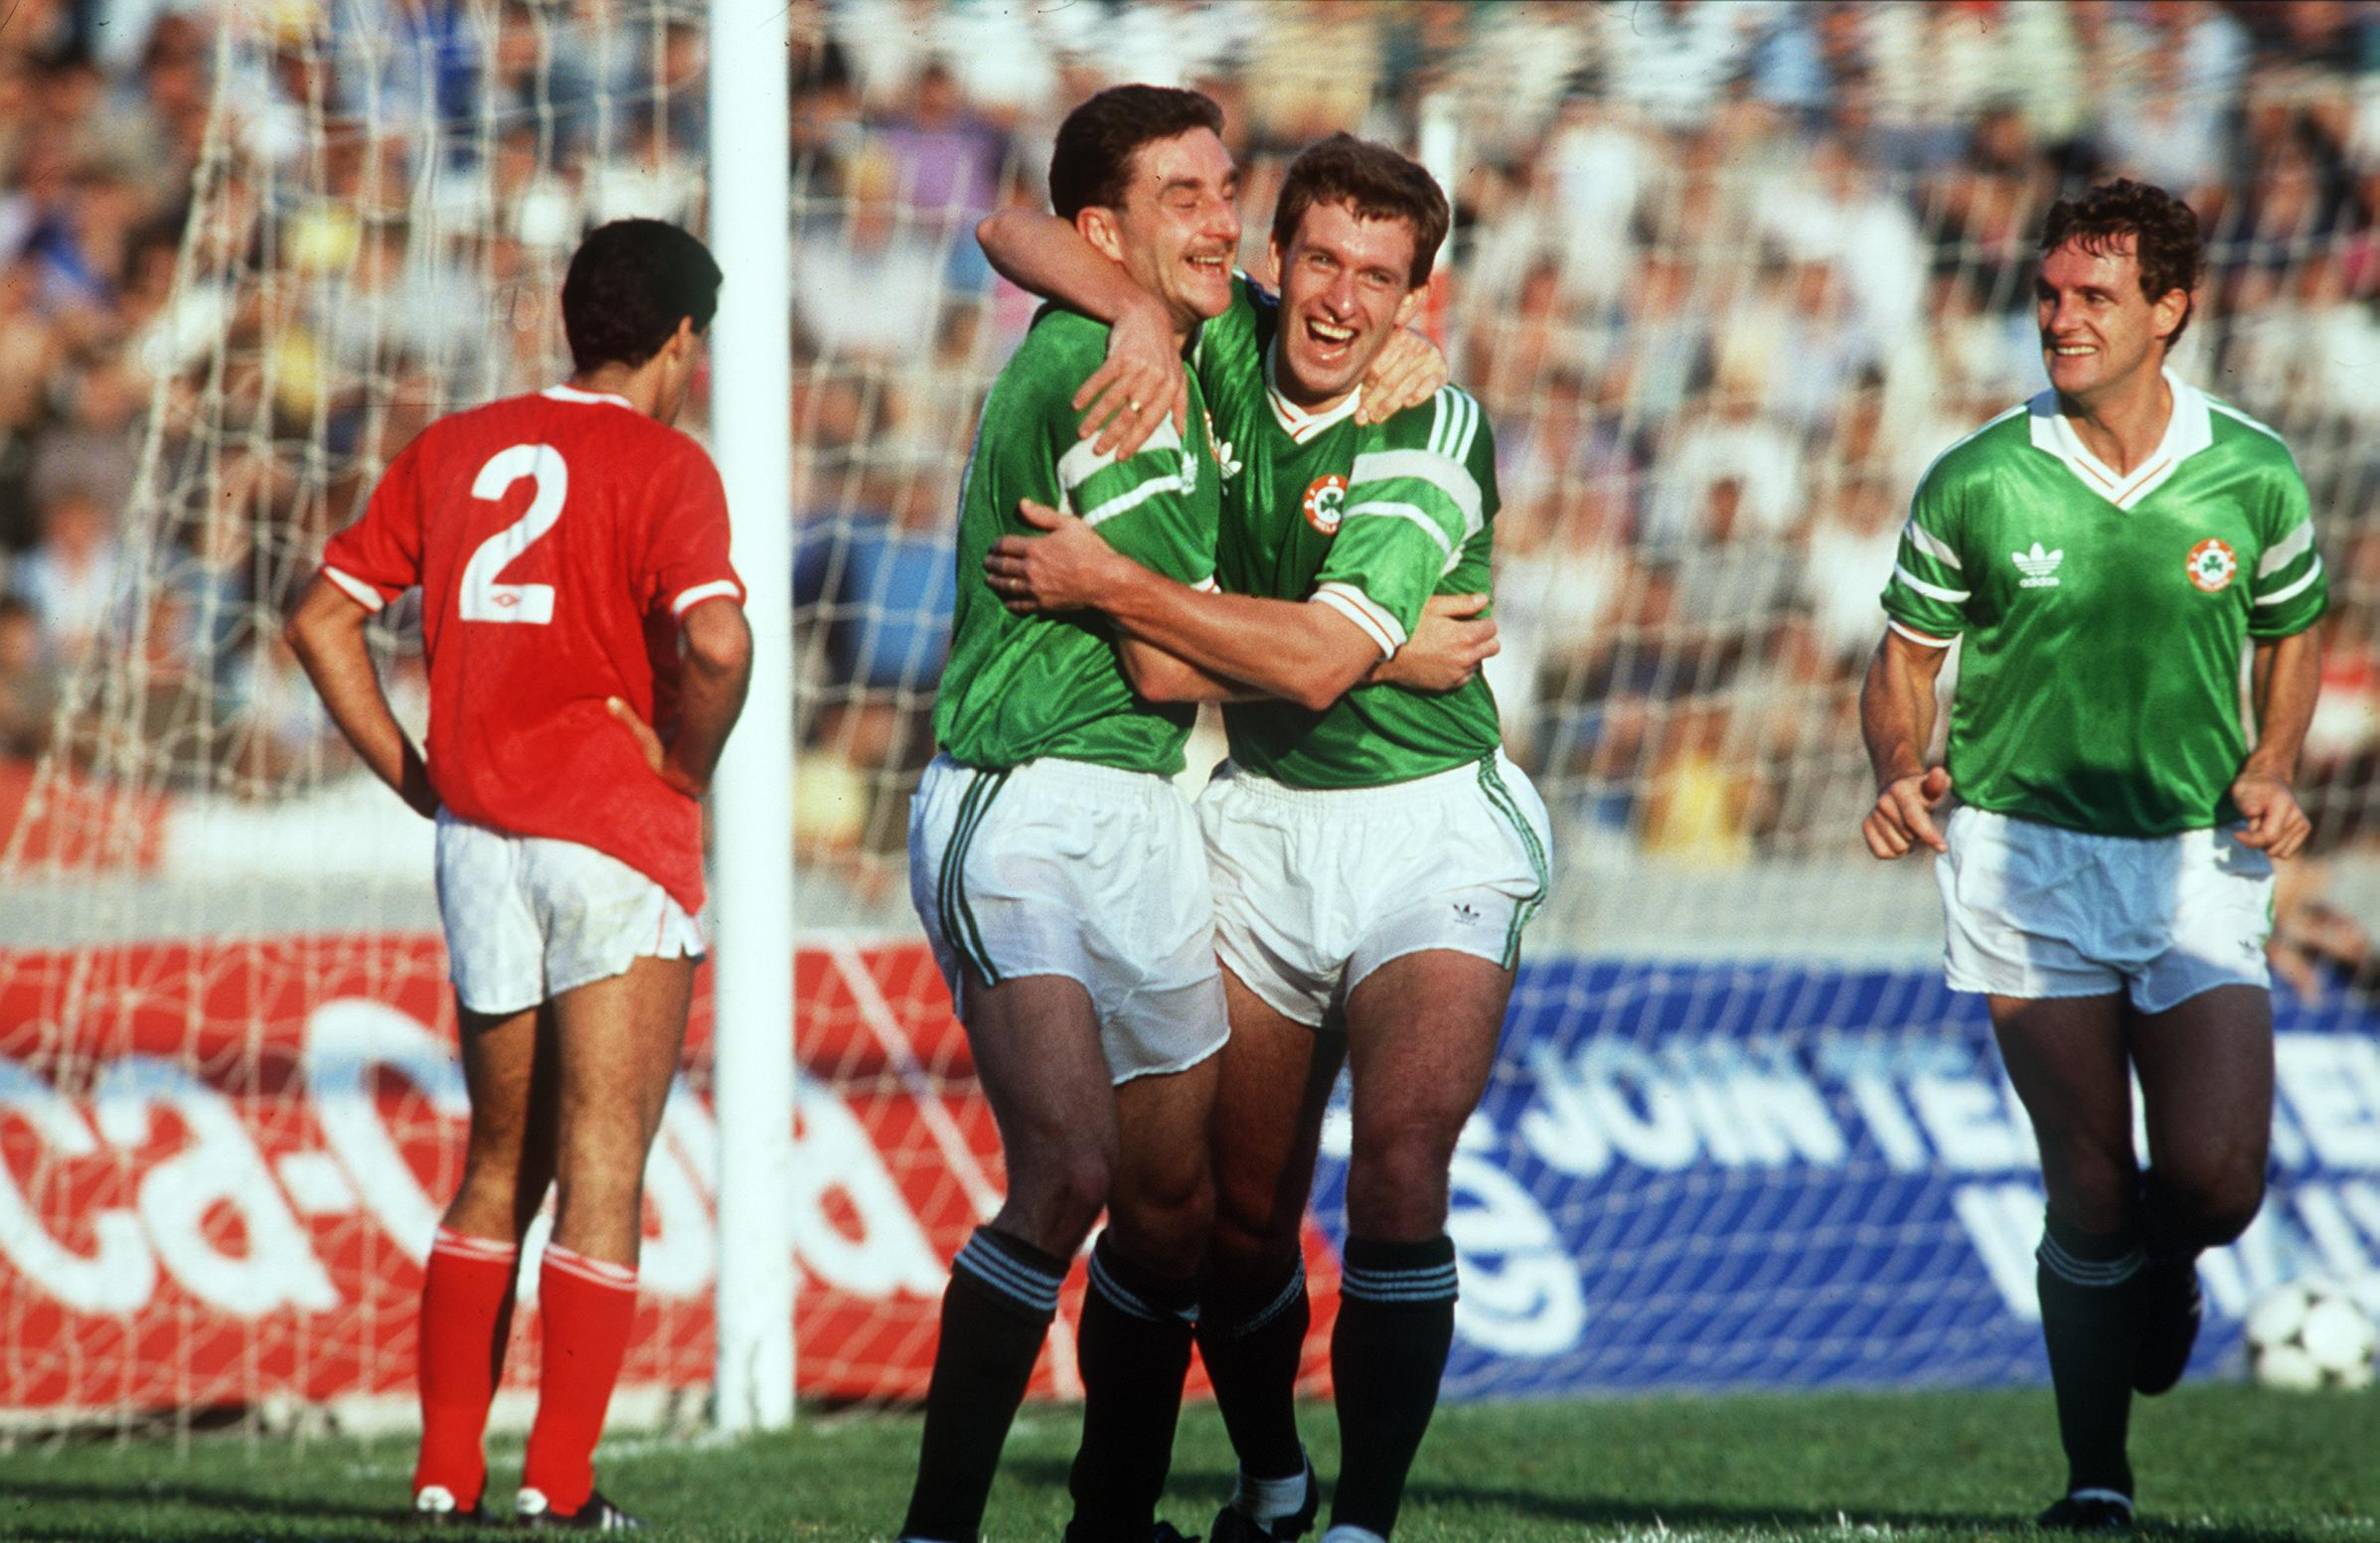 Malta vs Republic of Ireland  15/11/1989 John Aldridge and Kevin Sheedy celebrate goal ©INPHO/Billy Stickland